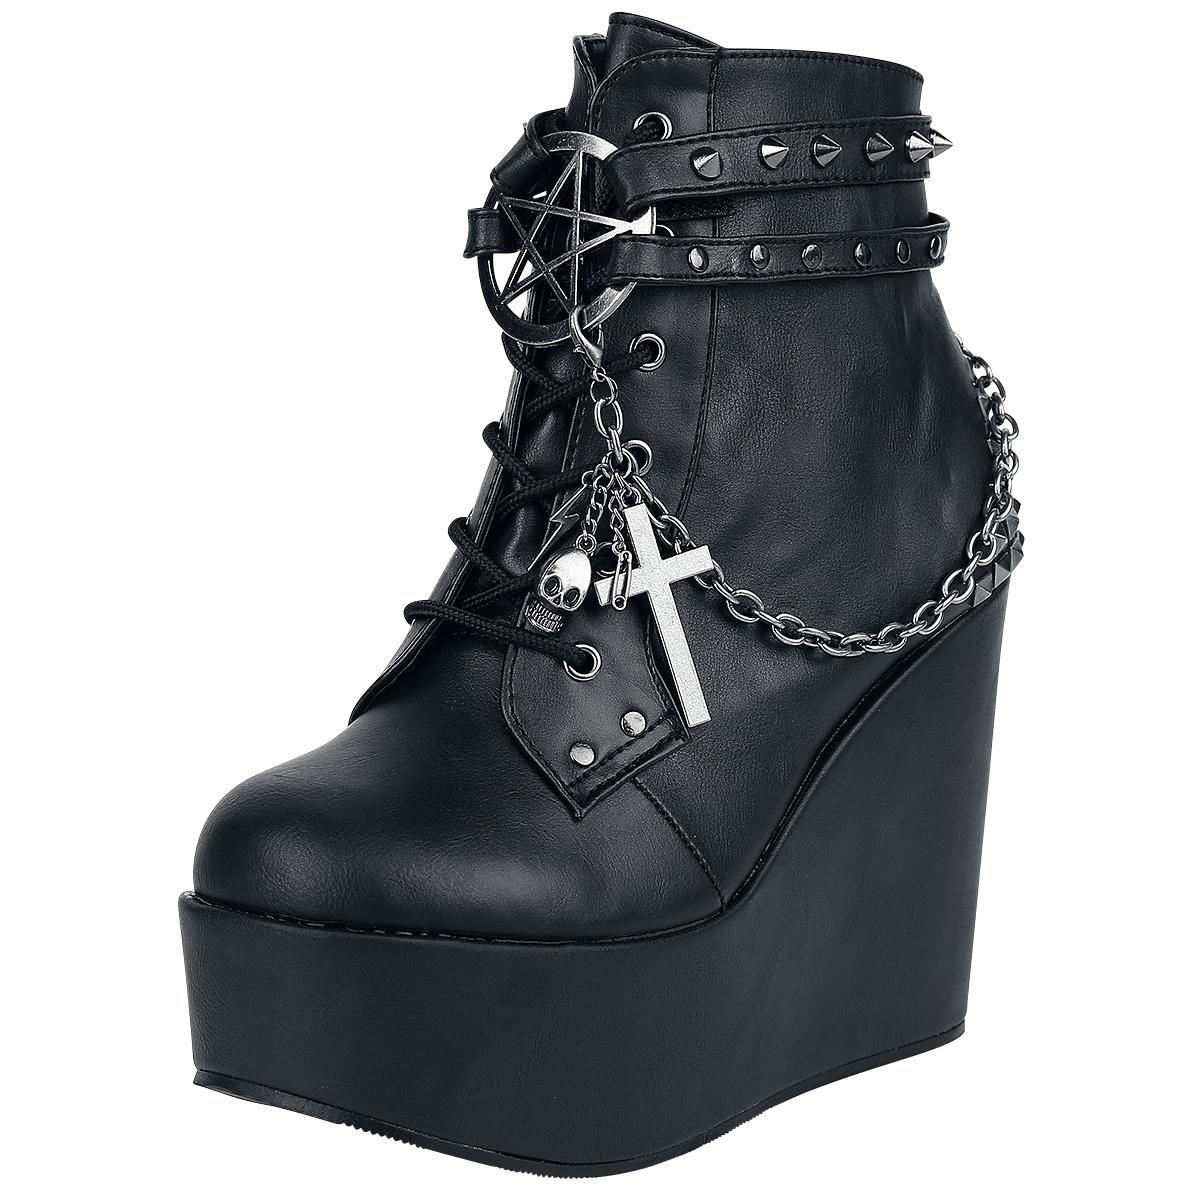 9e54df4aa2 Poison- 101 | Schuhe | Scarpe vegane, Scarpe e Scarpe strane